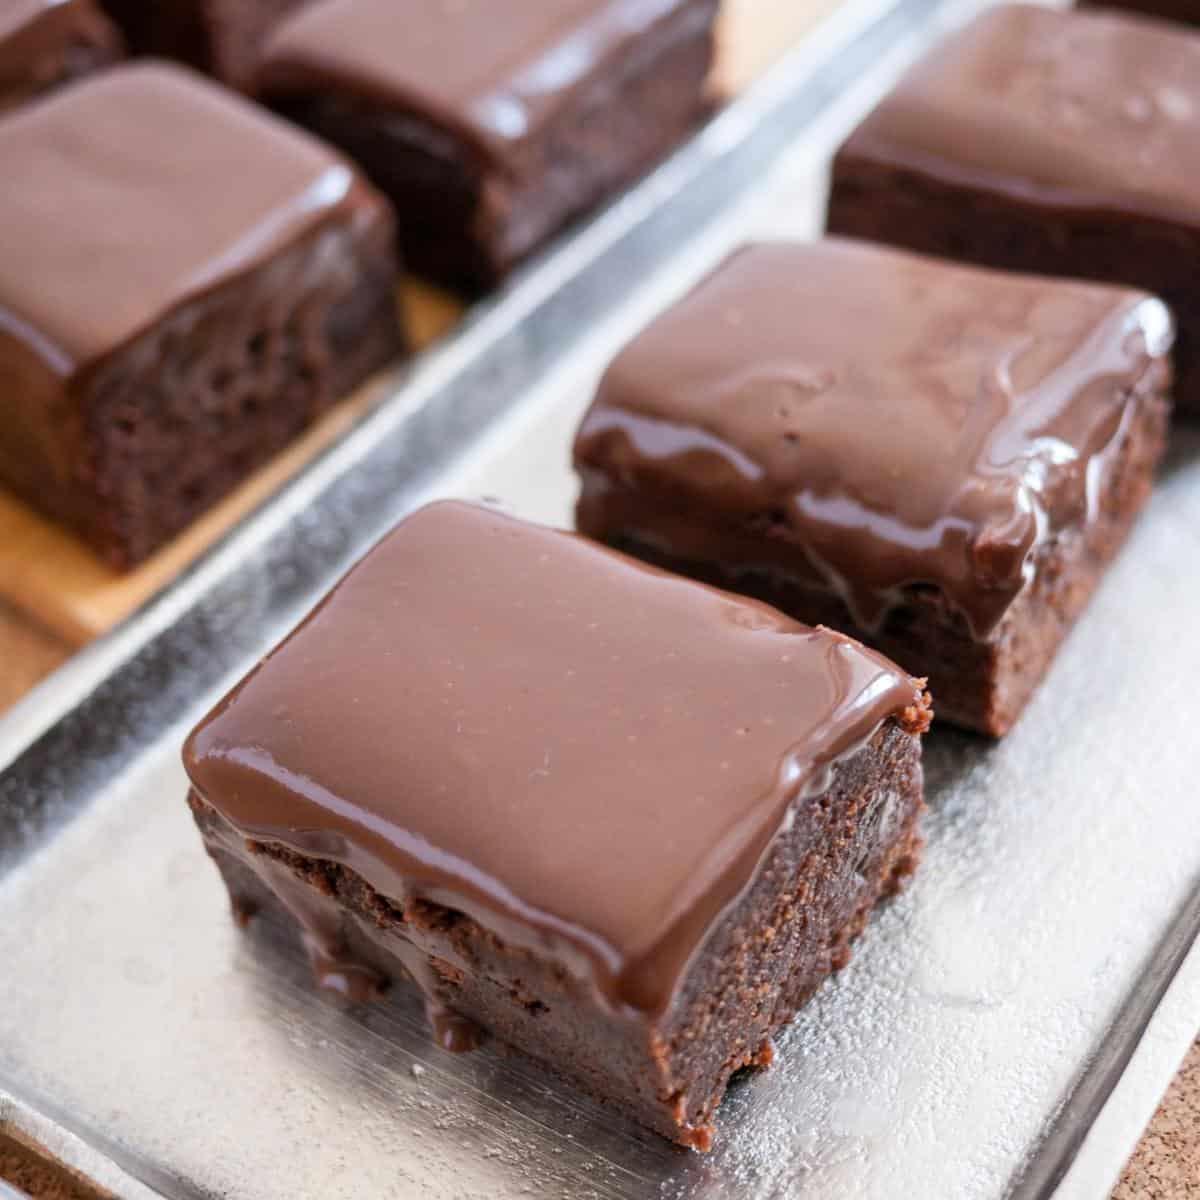 Chocolate fudge brownies on a tray.